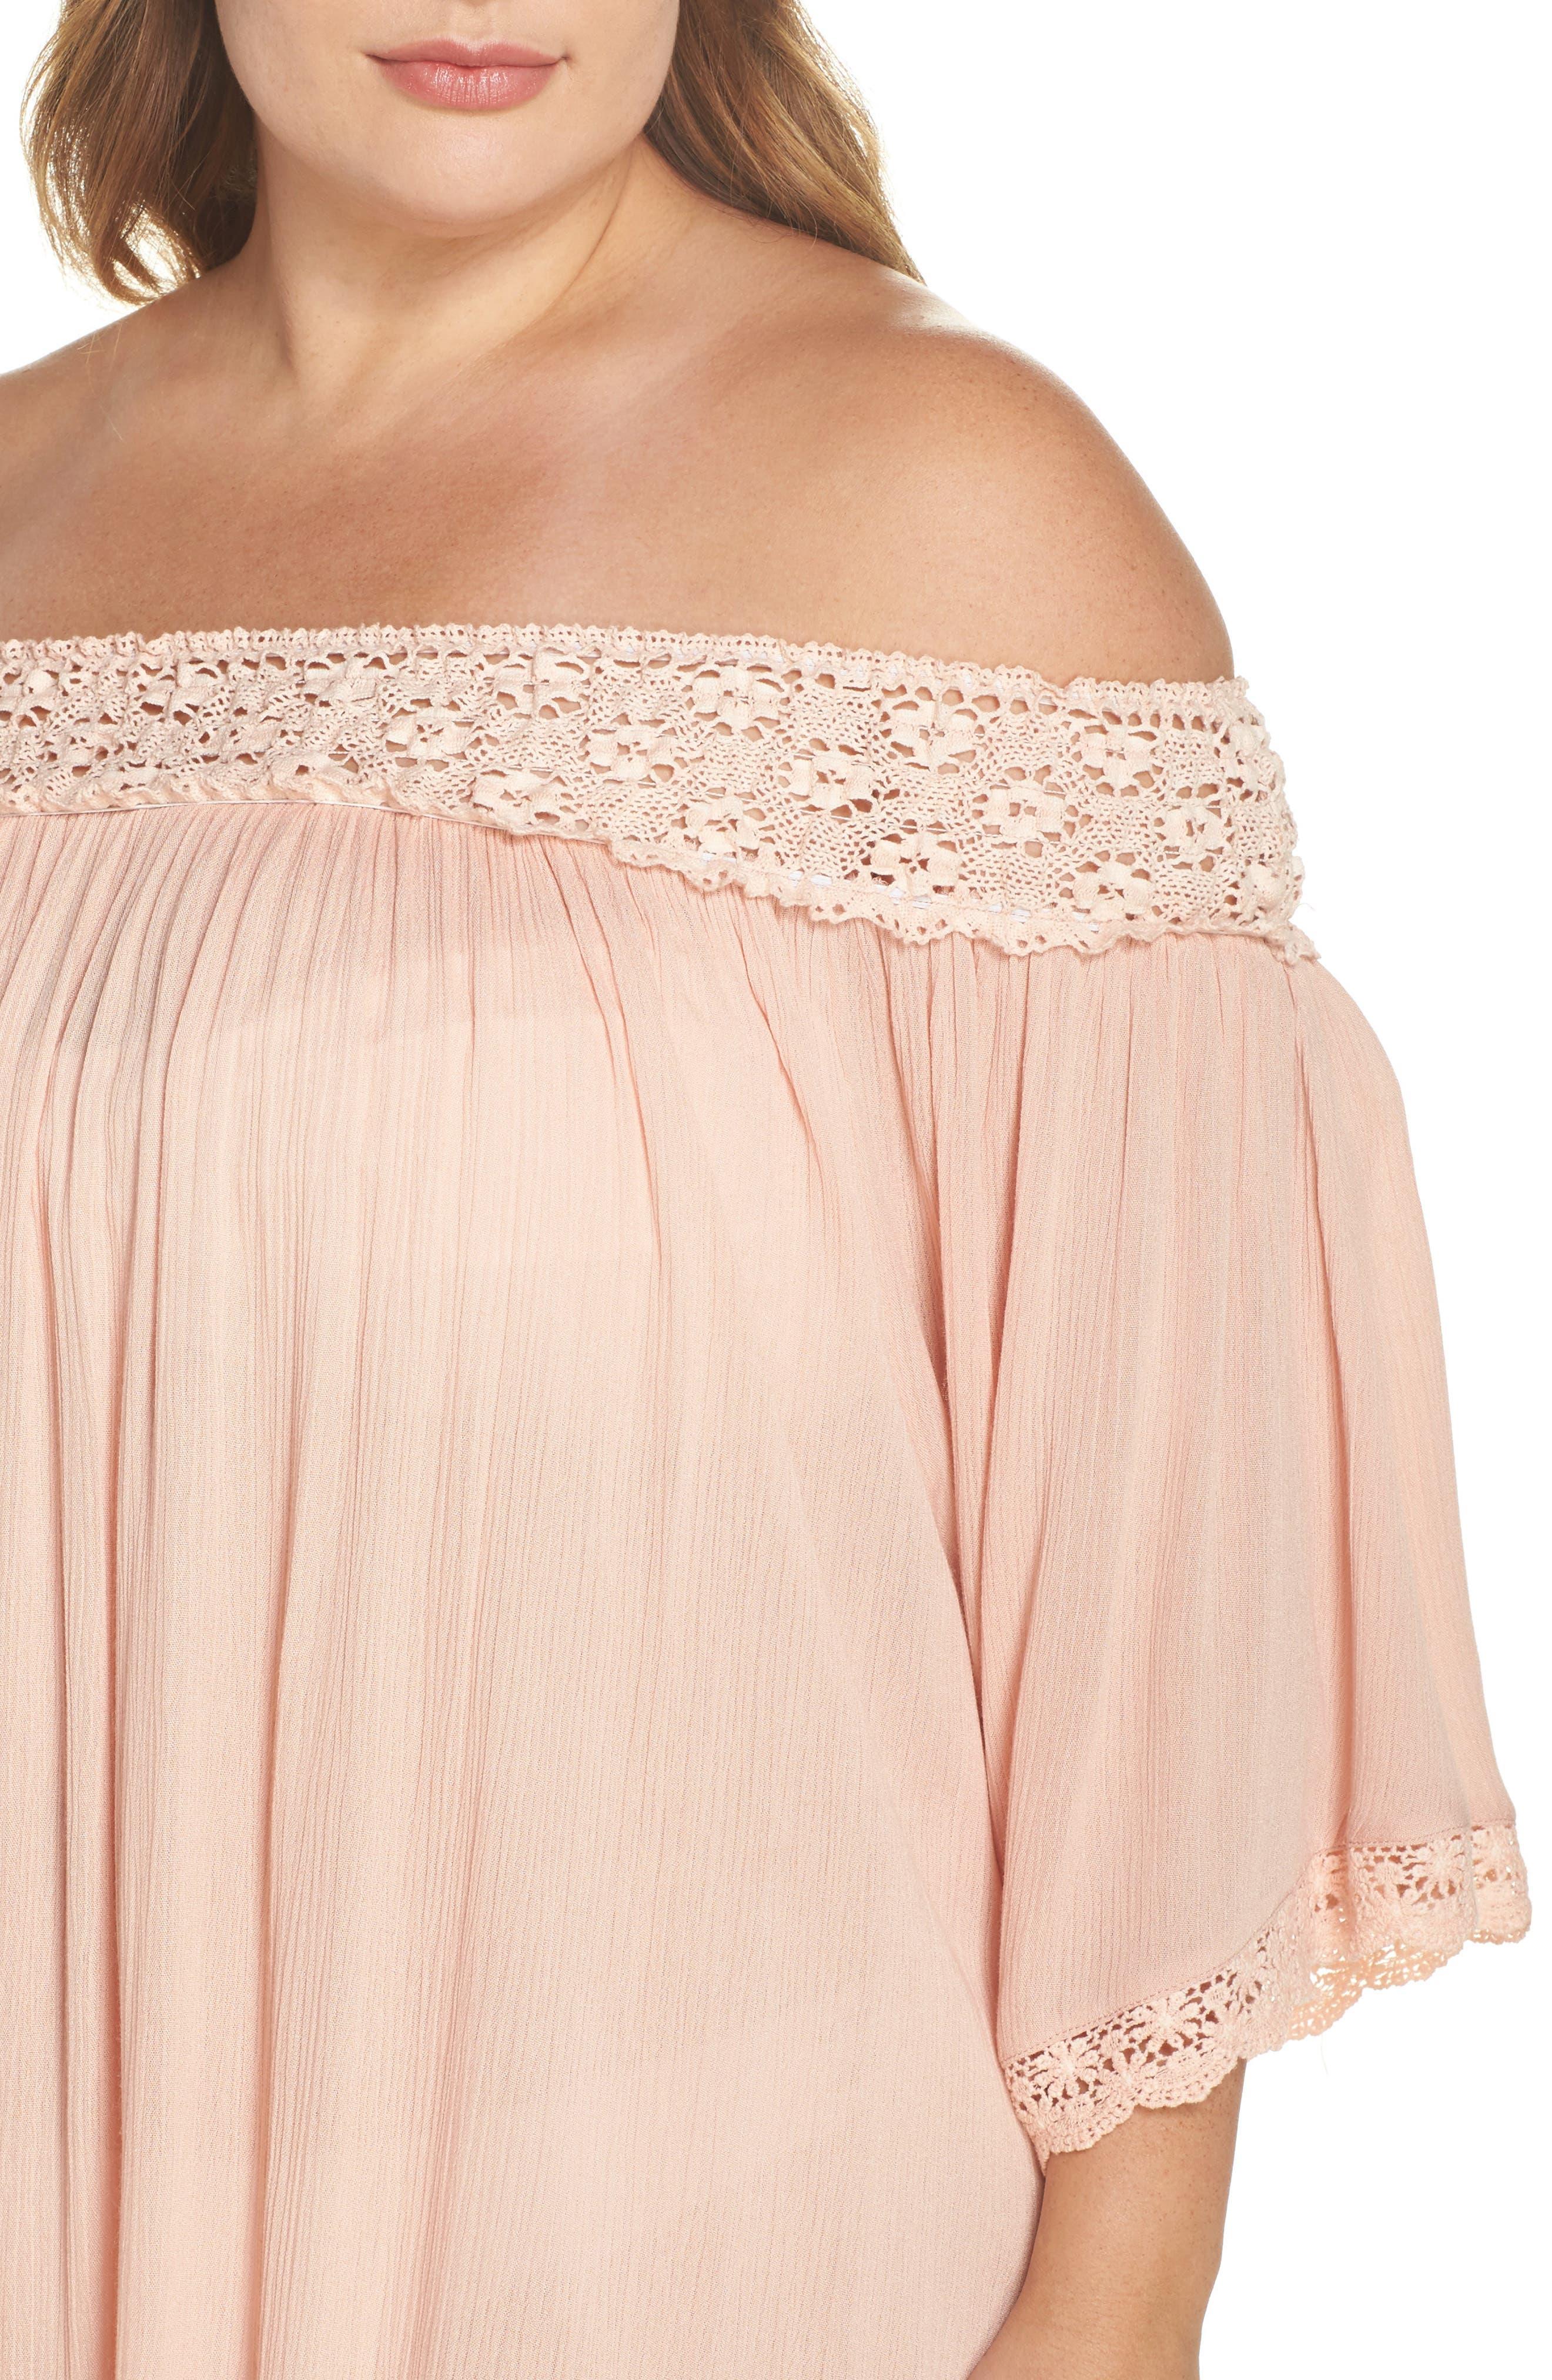 Rimini Crochet Cover-Up Dress,                             Alternate thumbnail 4, color,                             Pink